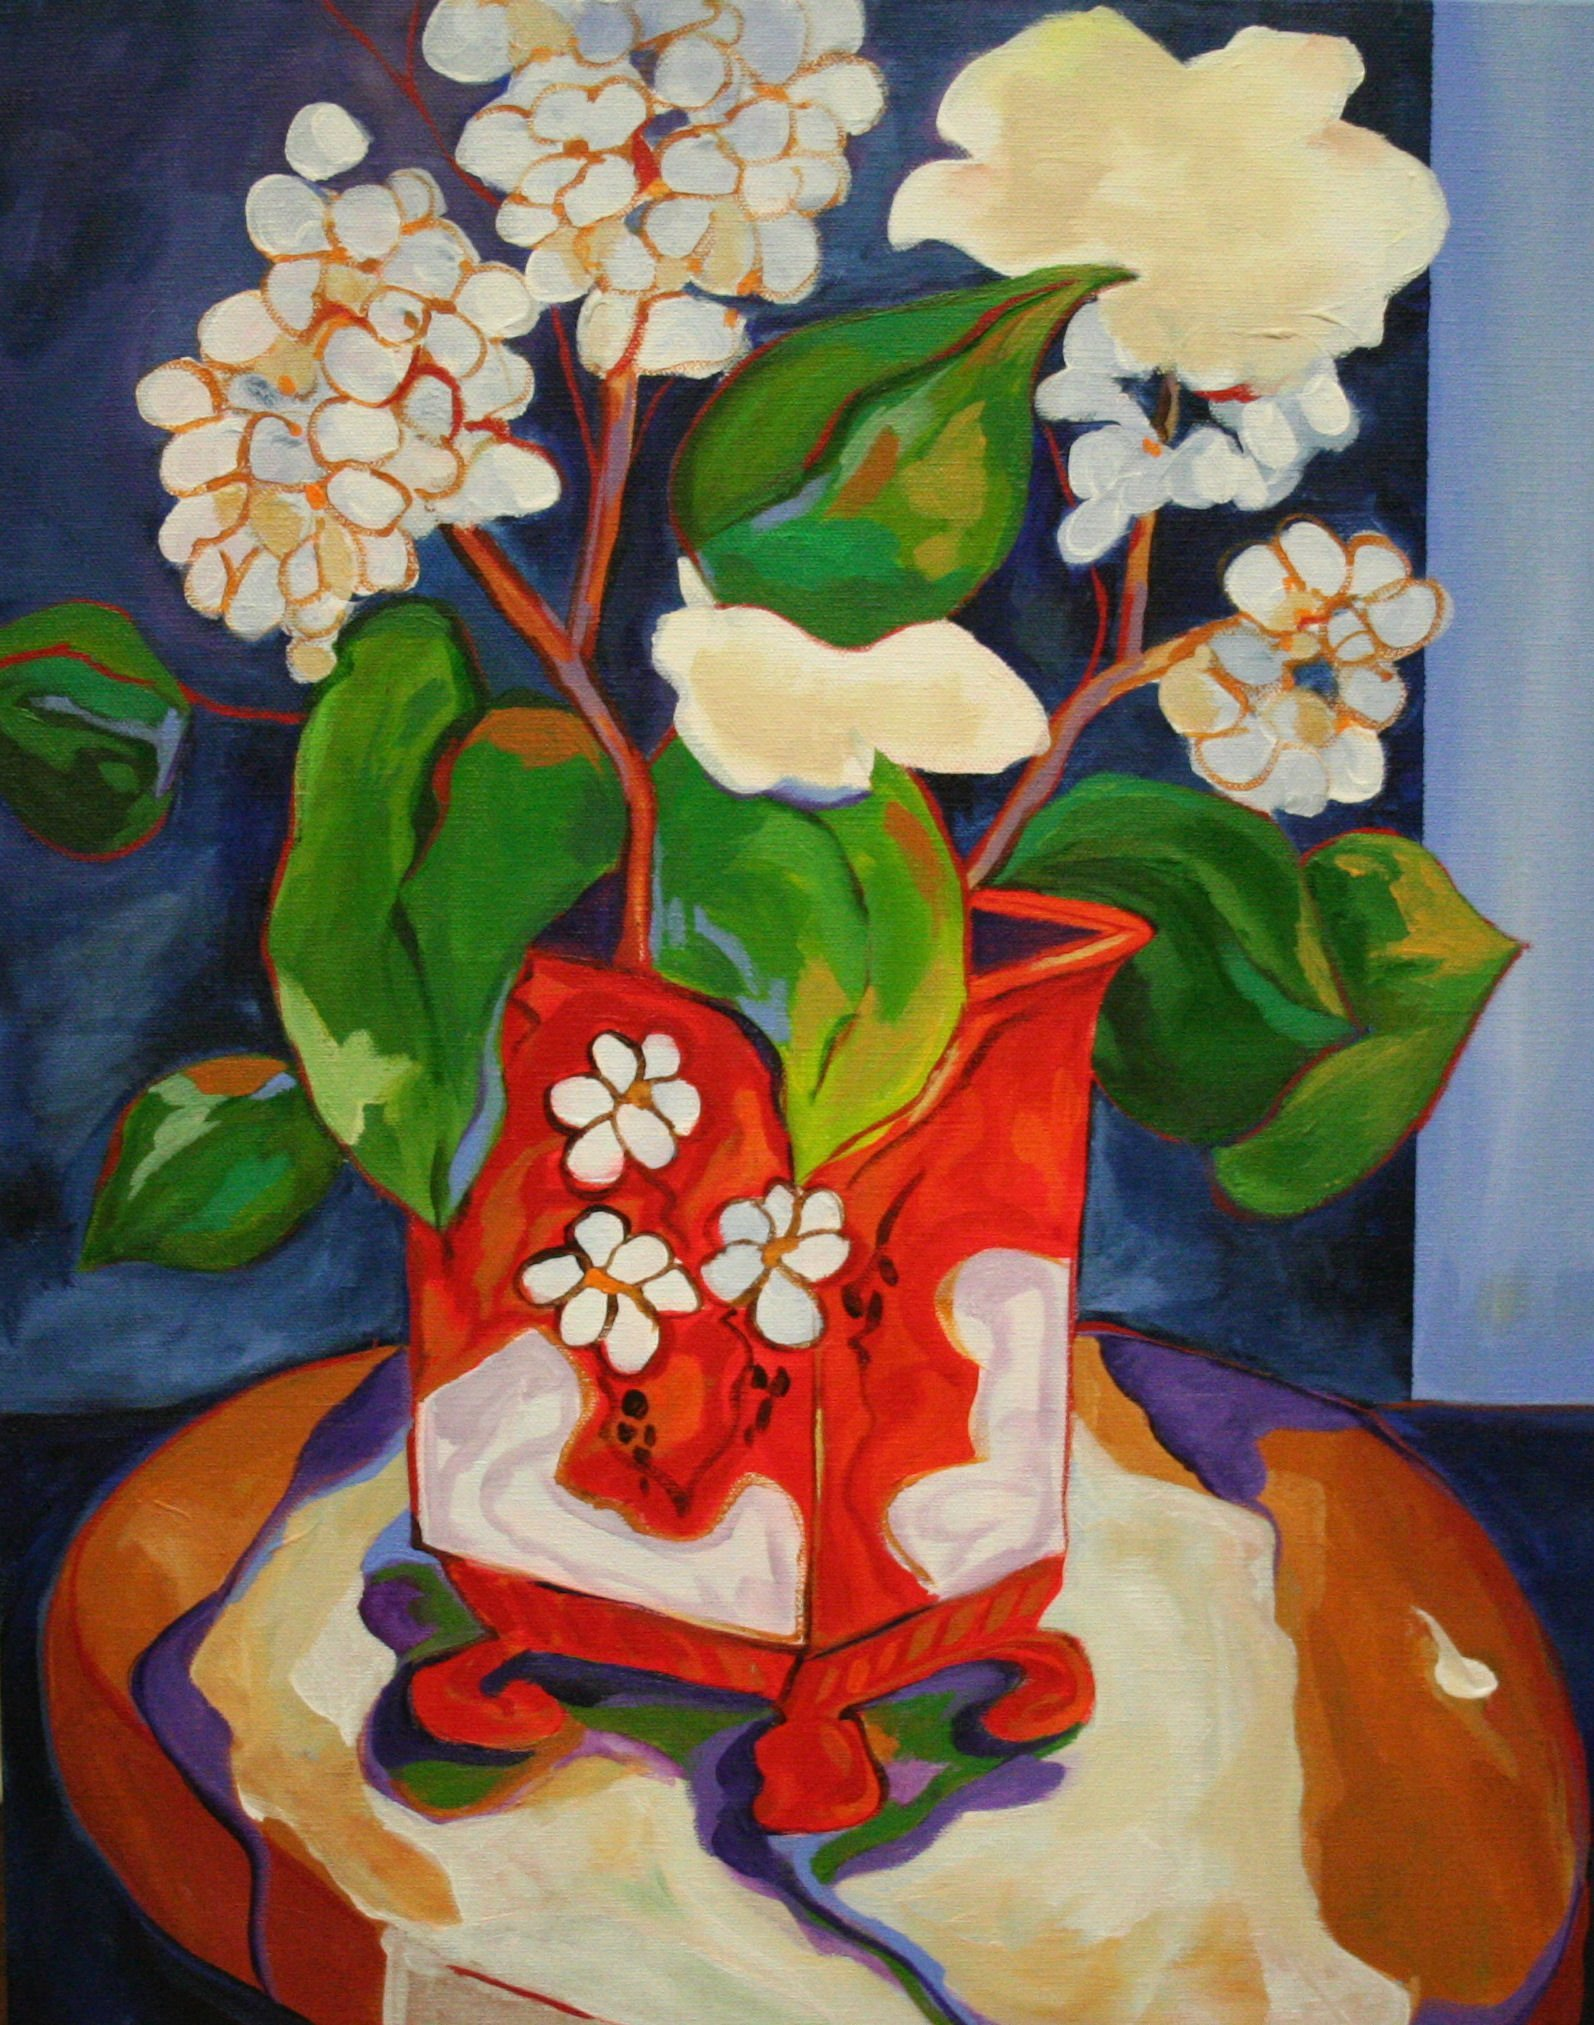 Vito Antonio Ferrante Red Vase II